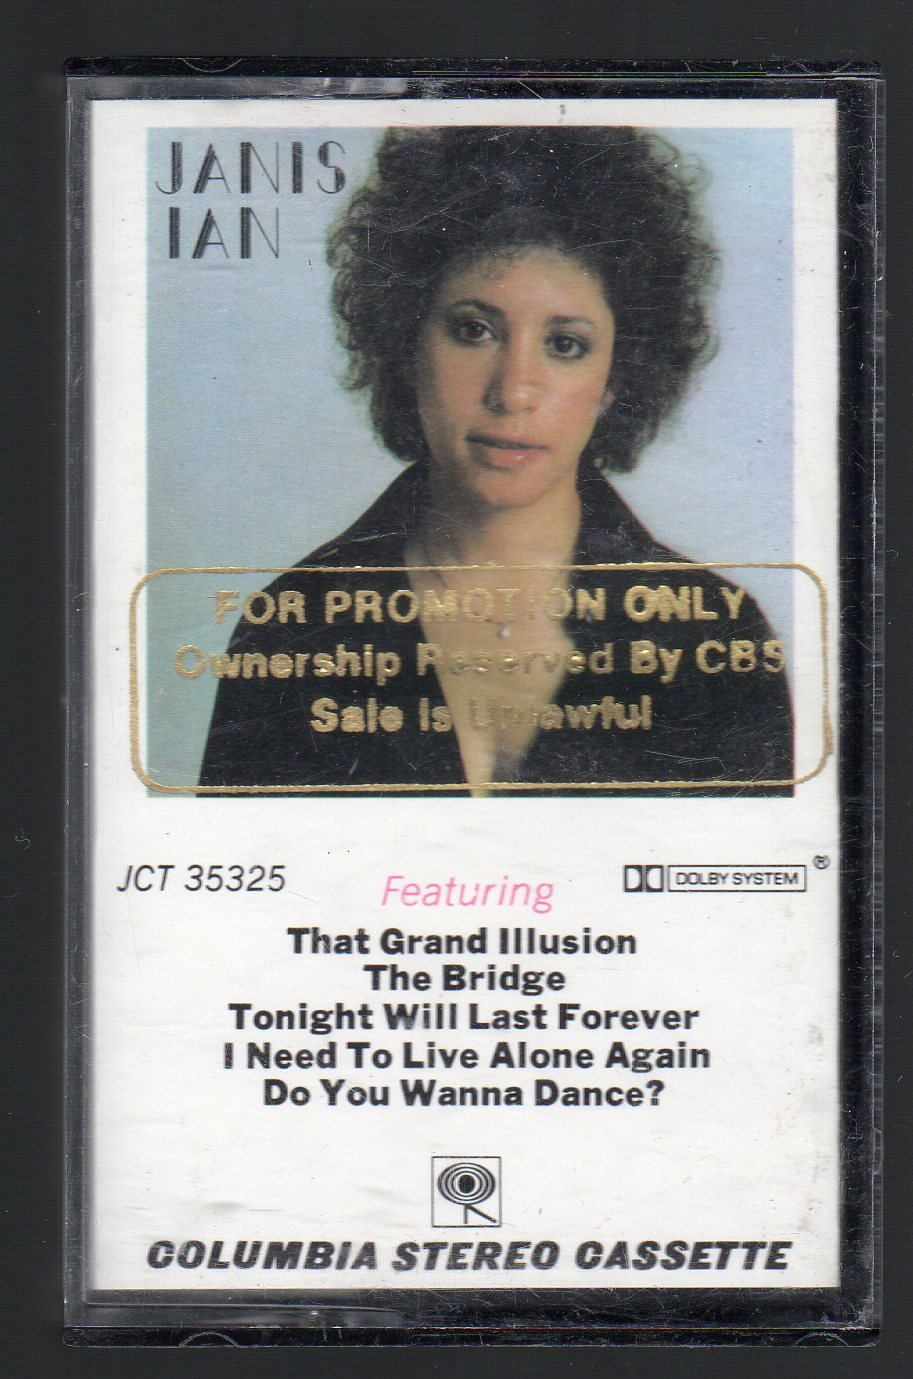 Janis Ian - Janis Ian PROMO RARE Cassette Tape